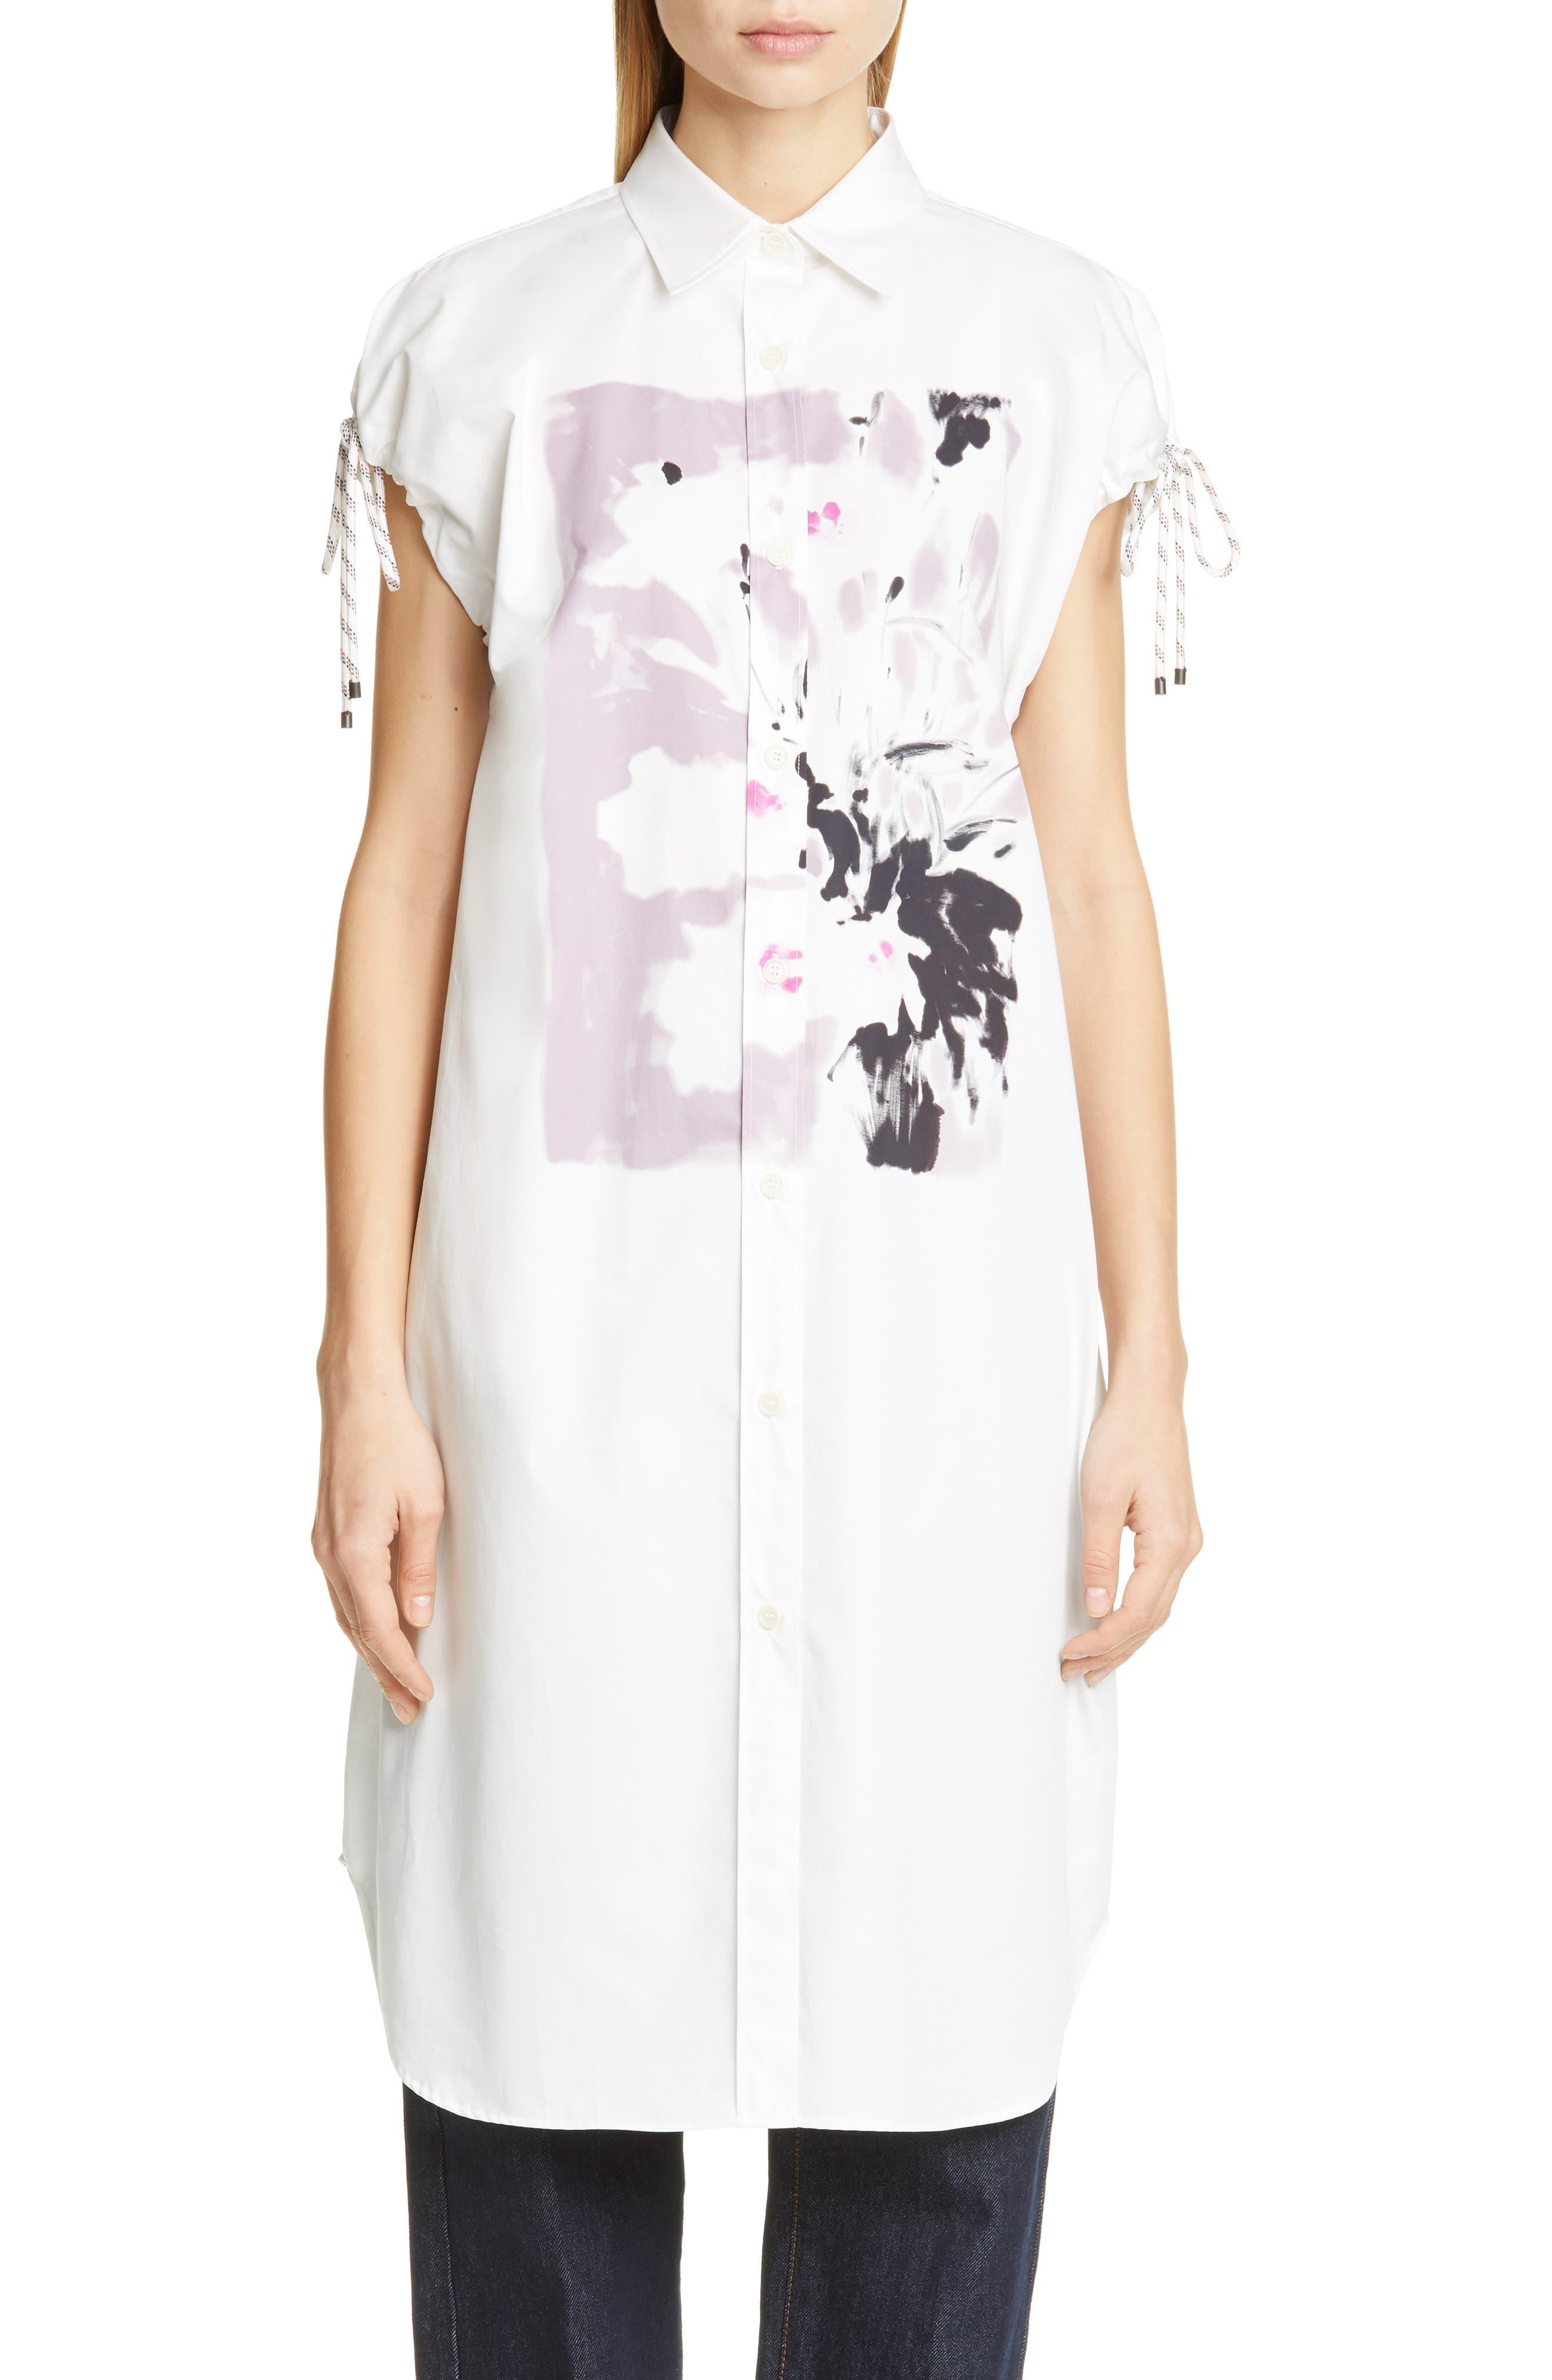 DRIES VAN NOTEN, Dantia Floral Print Cotton Shirt, Main thumbnail 1, color, LILAC